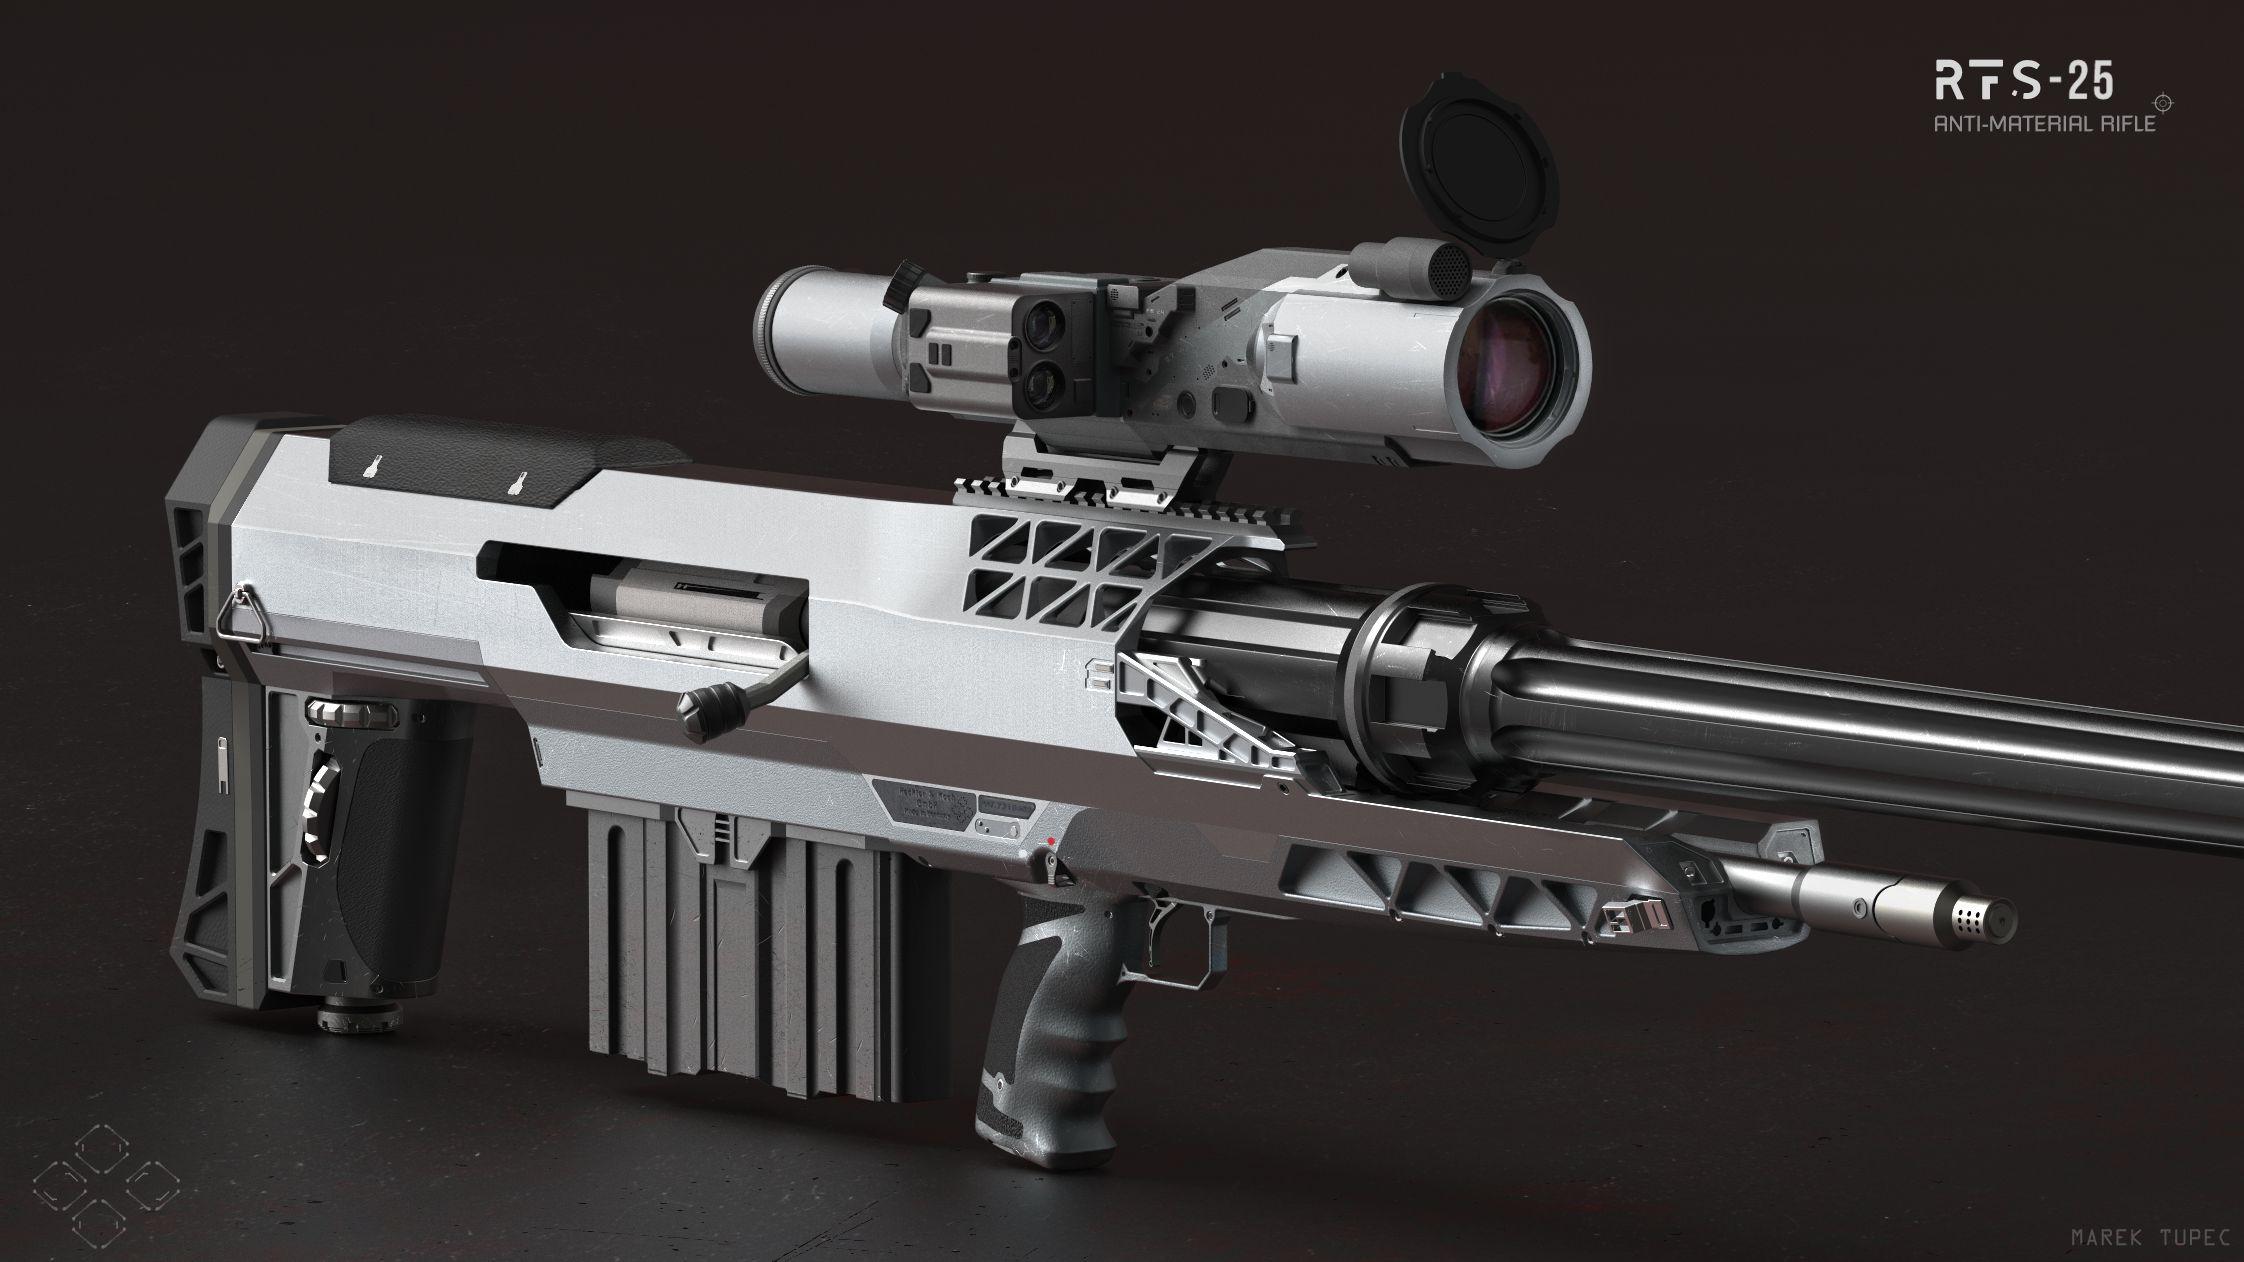 Rfs 25 Anti Material Rifle Autodesk Online Gallery